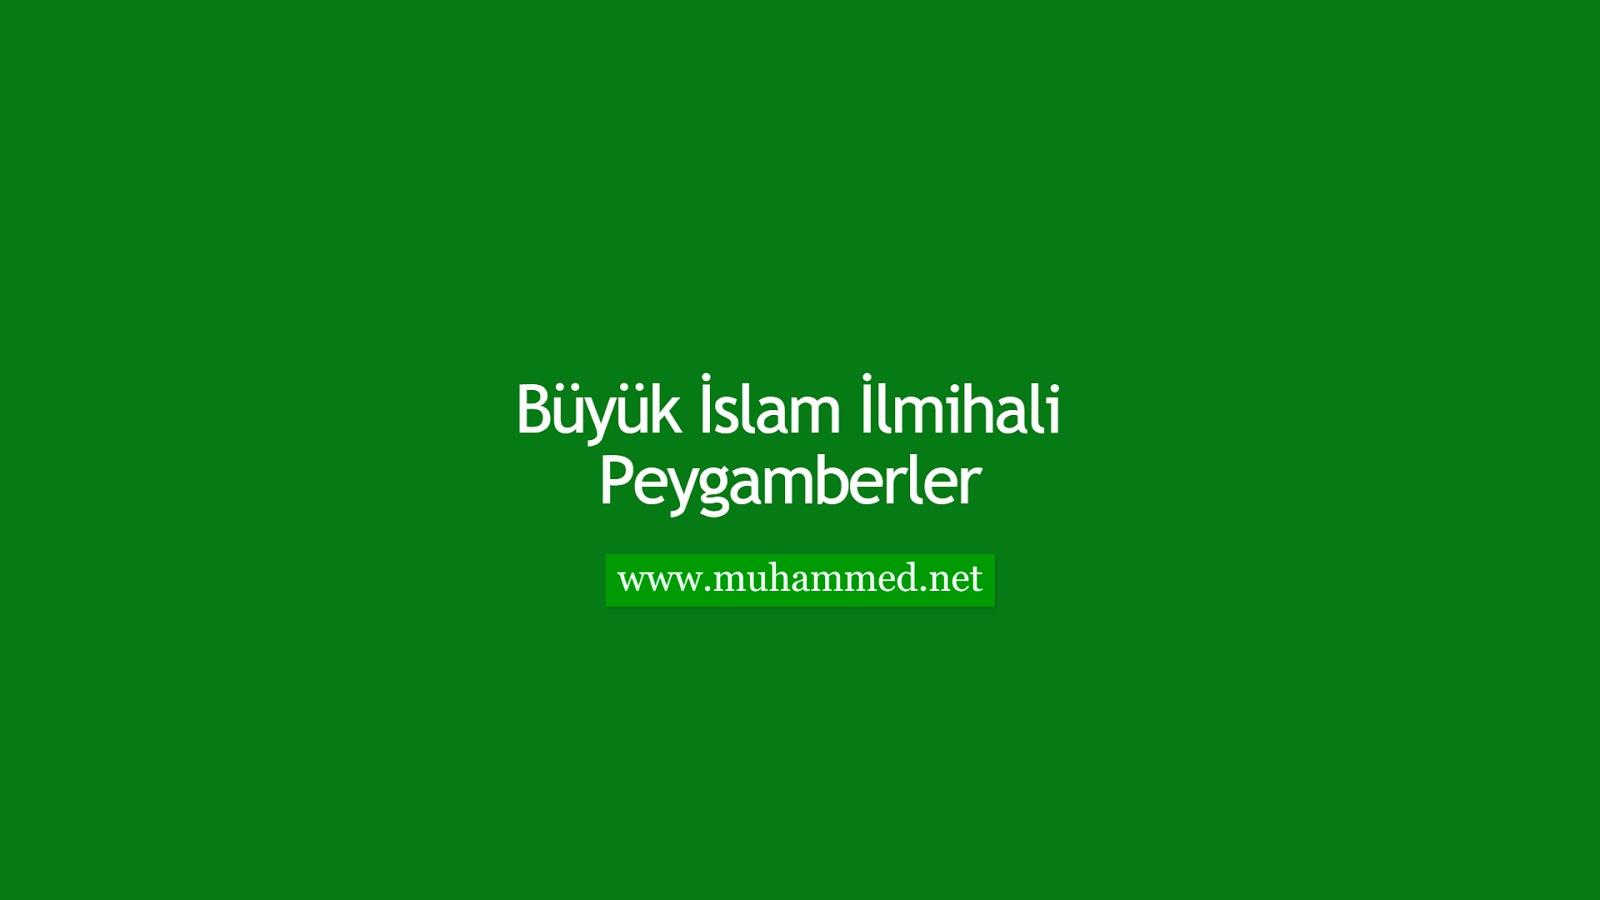 İlmihal - Peygamberler